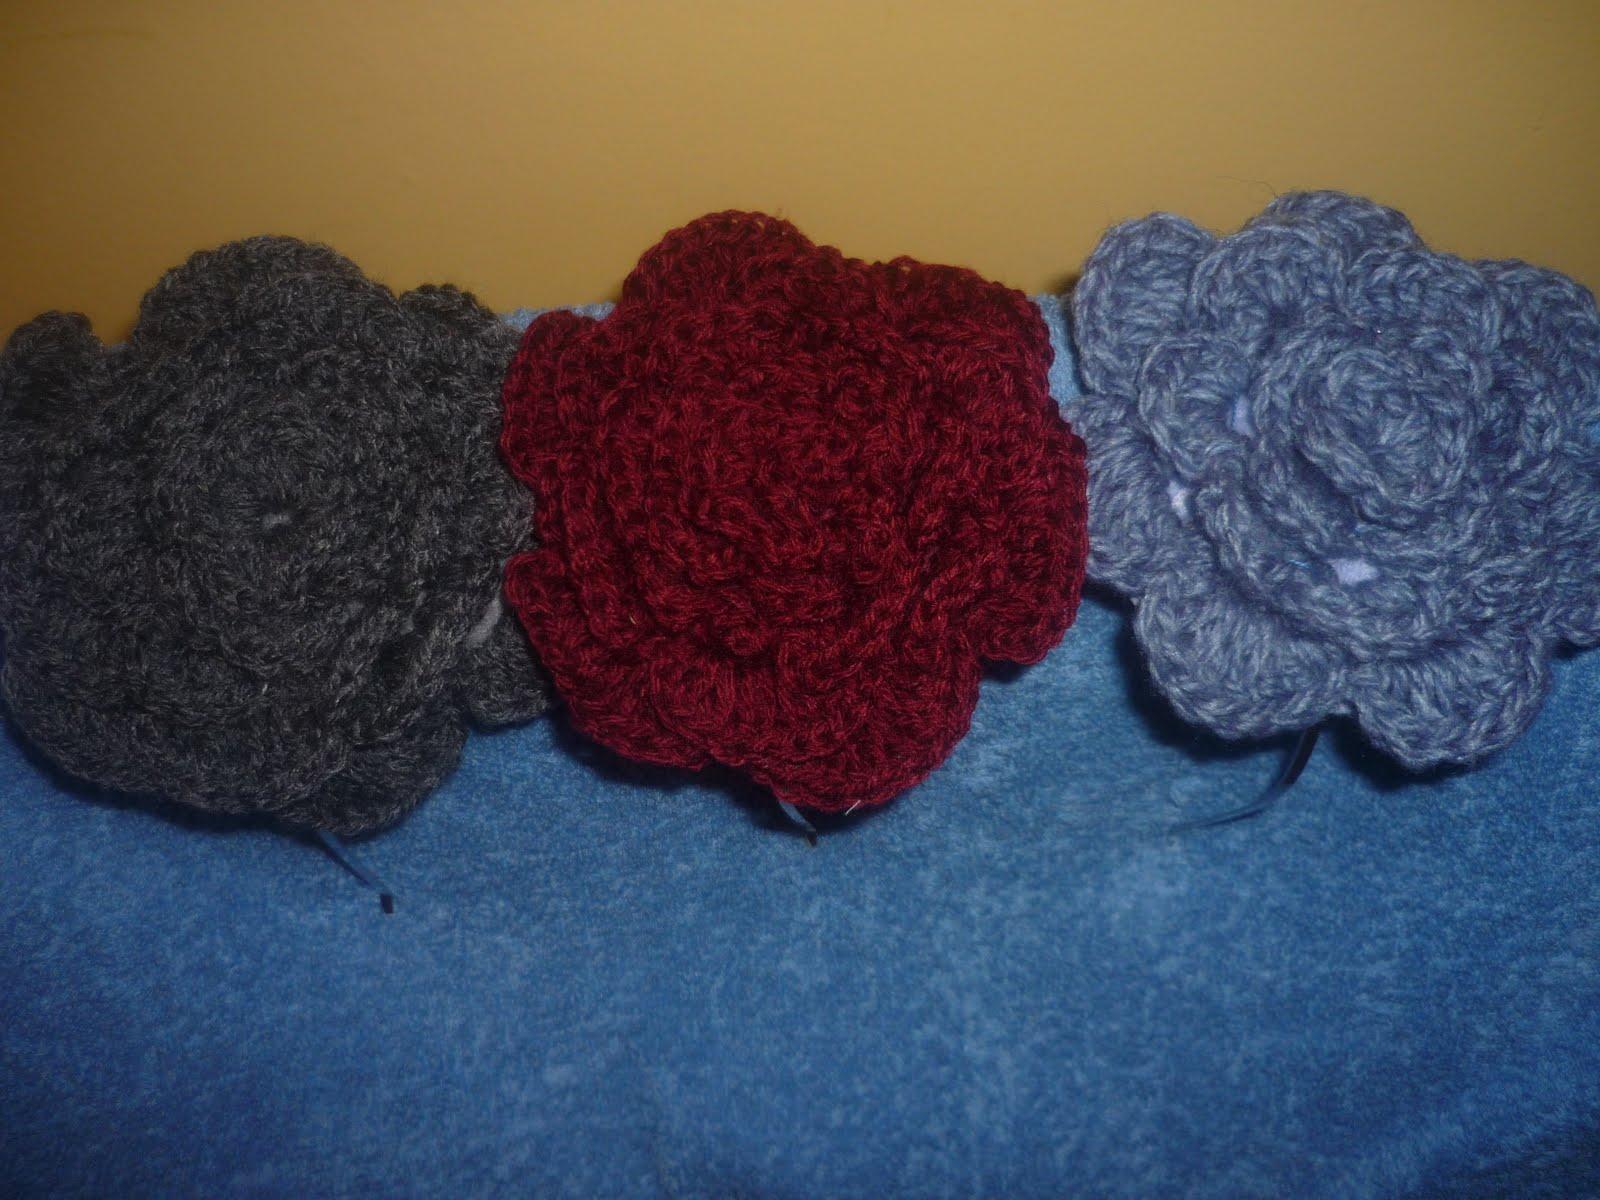 Pin diademas crochet on pinterest - Diademas a crochet ...